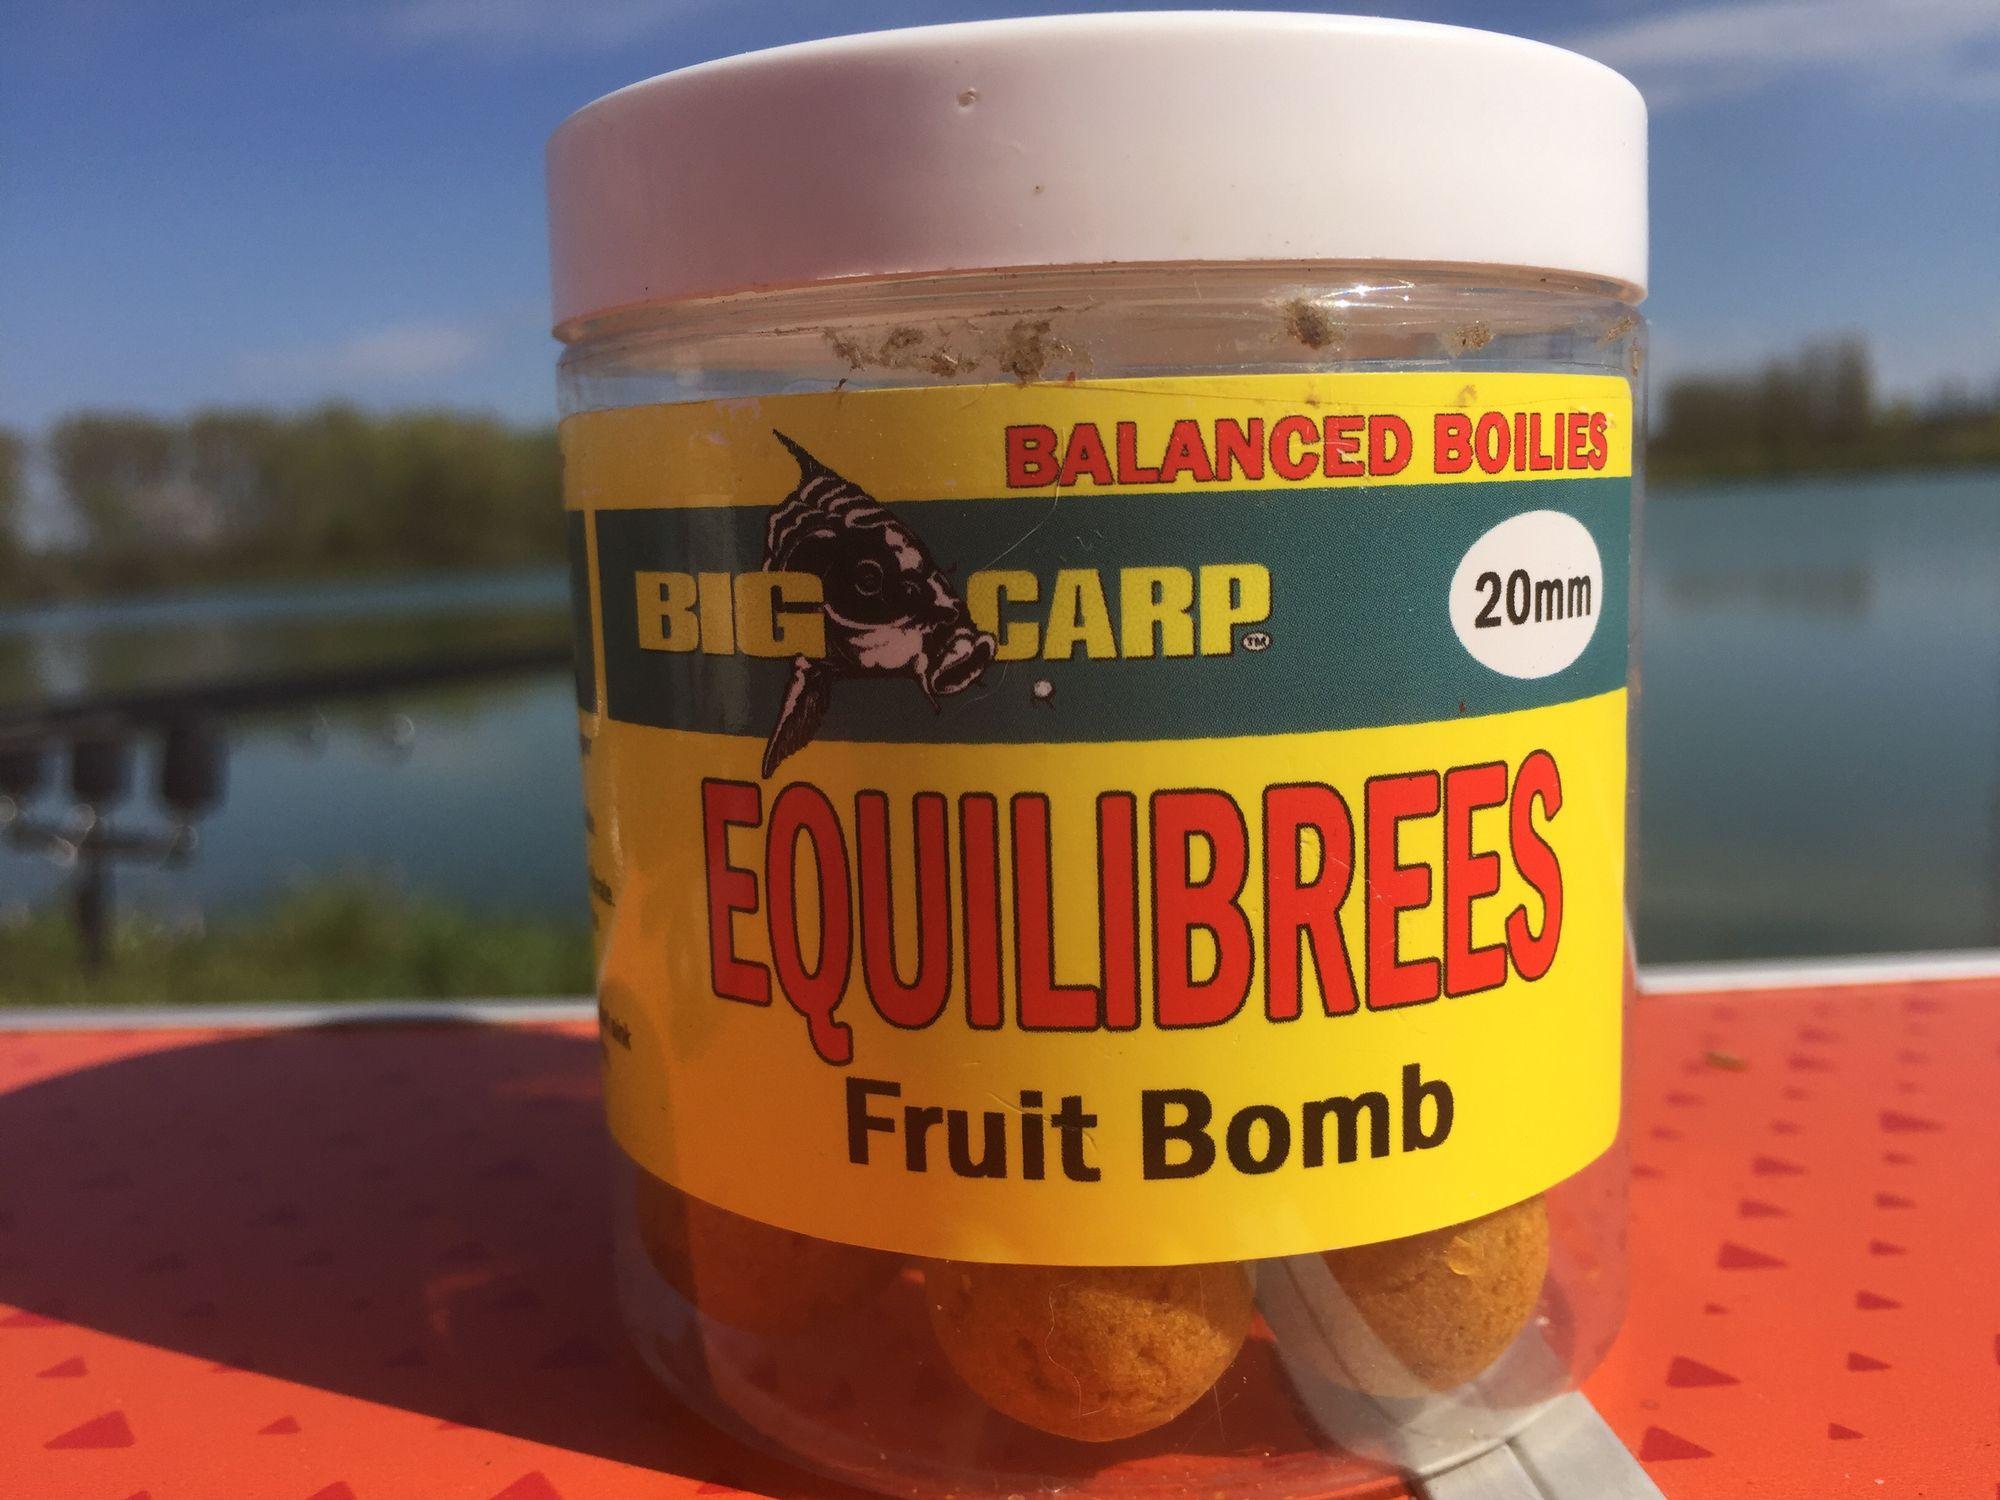 Big carp Fruit Bomb Equilibrée 20 Mm